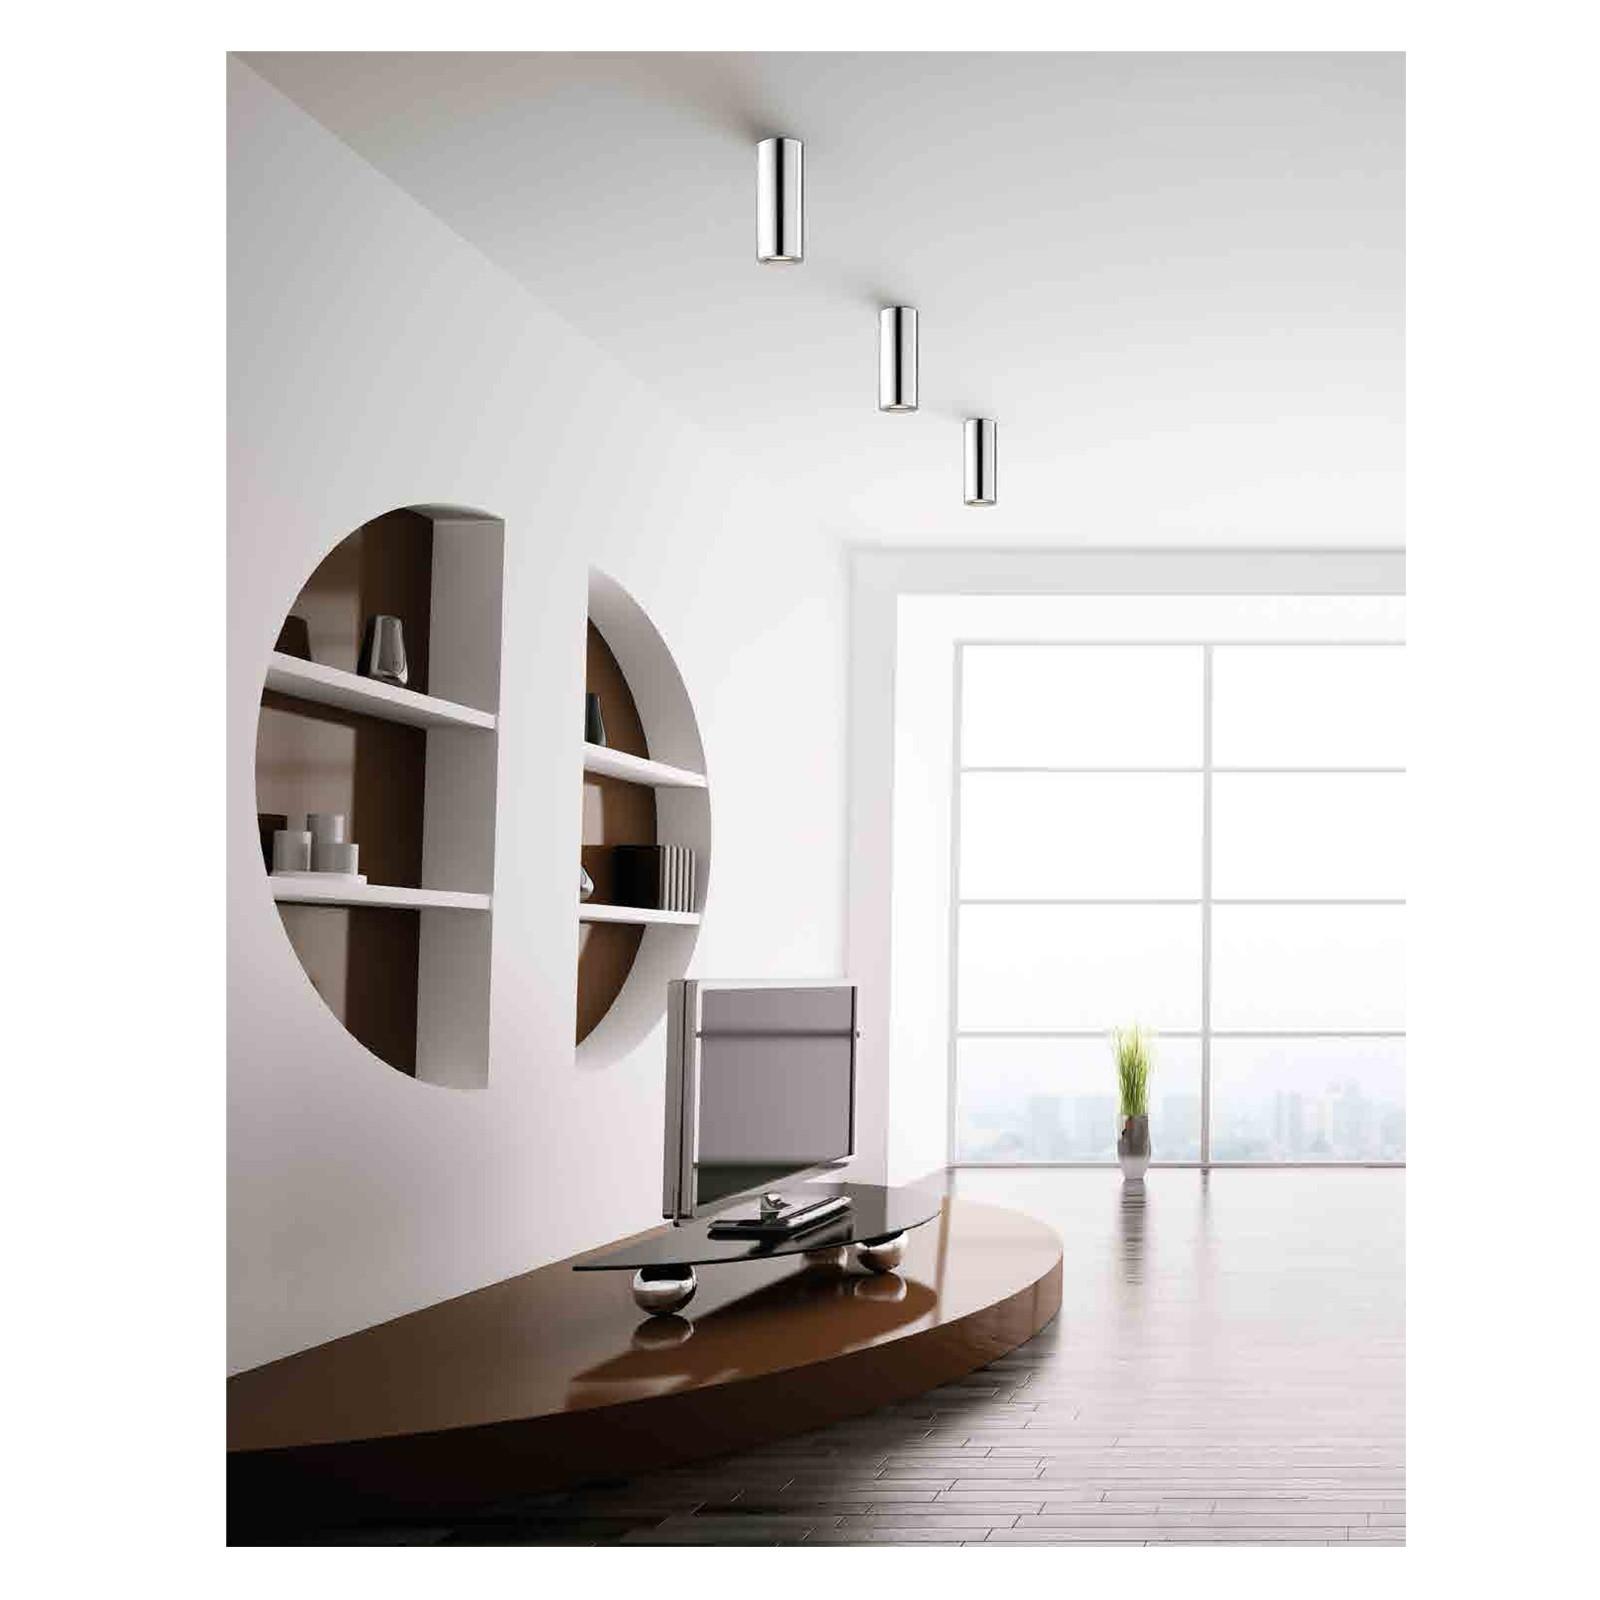 Lampada da soffitto a led lampadario moderno illuminazione for Lampadario da soffitto